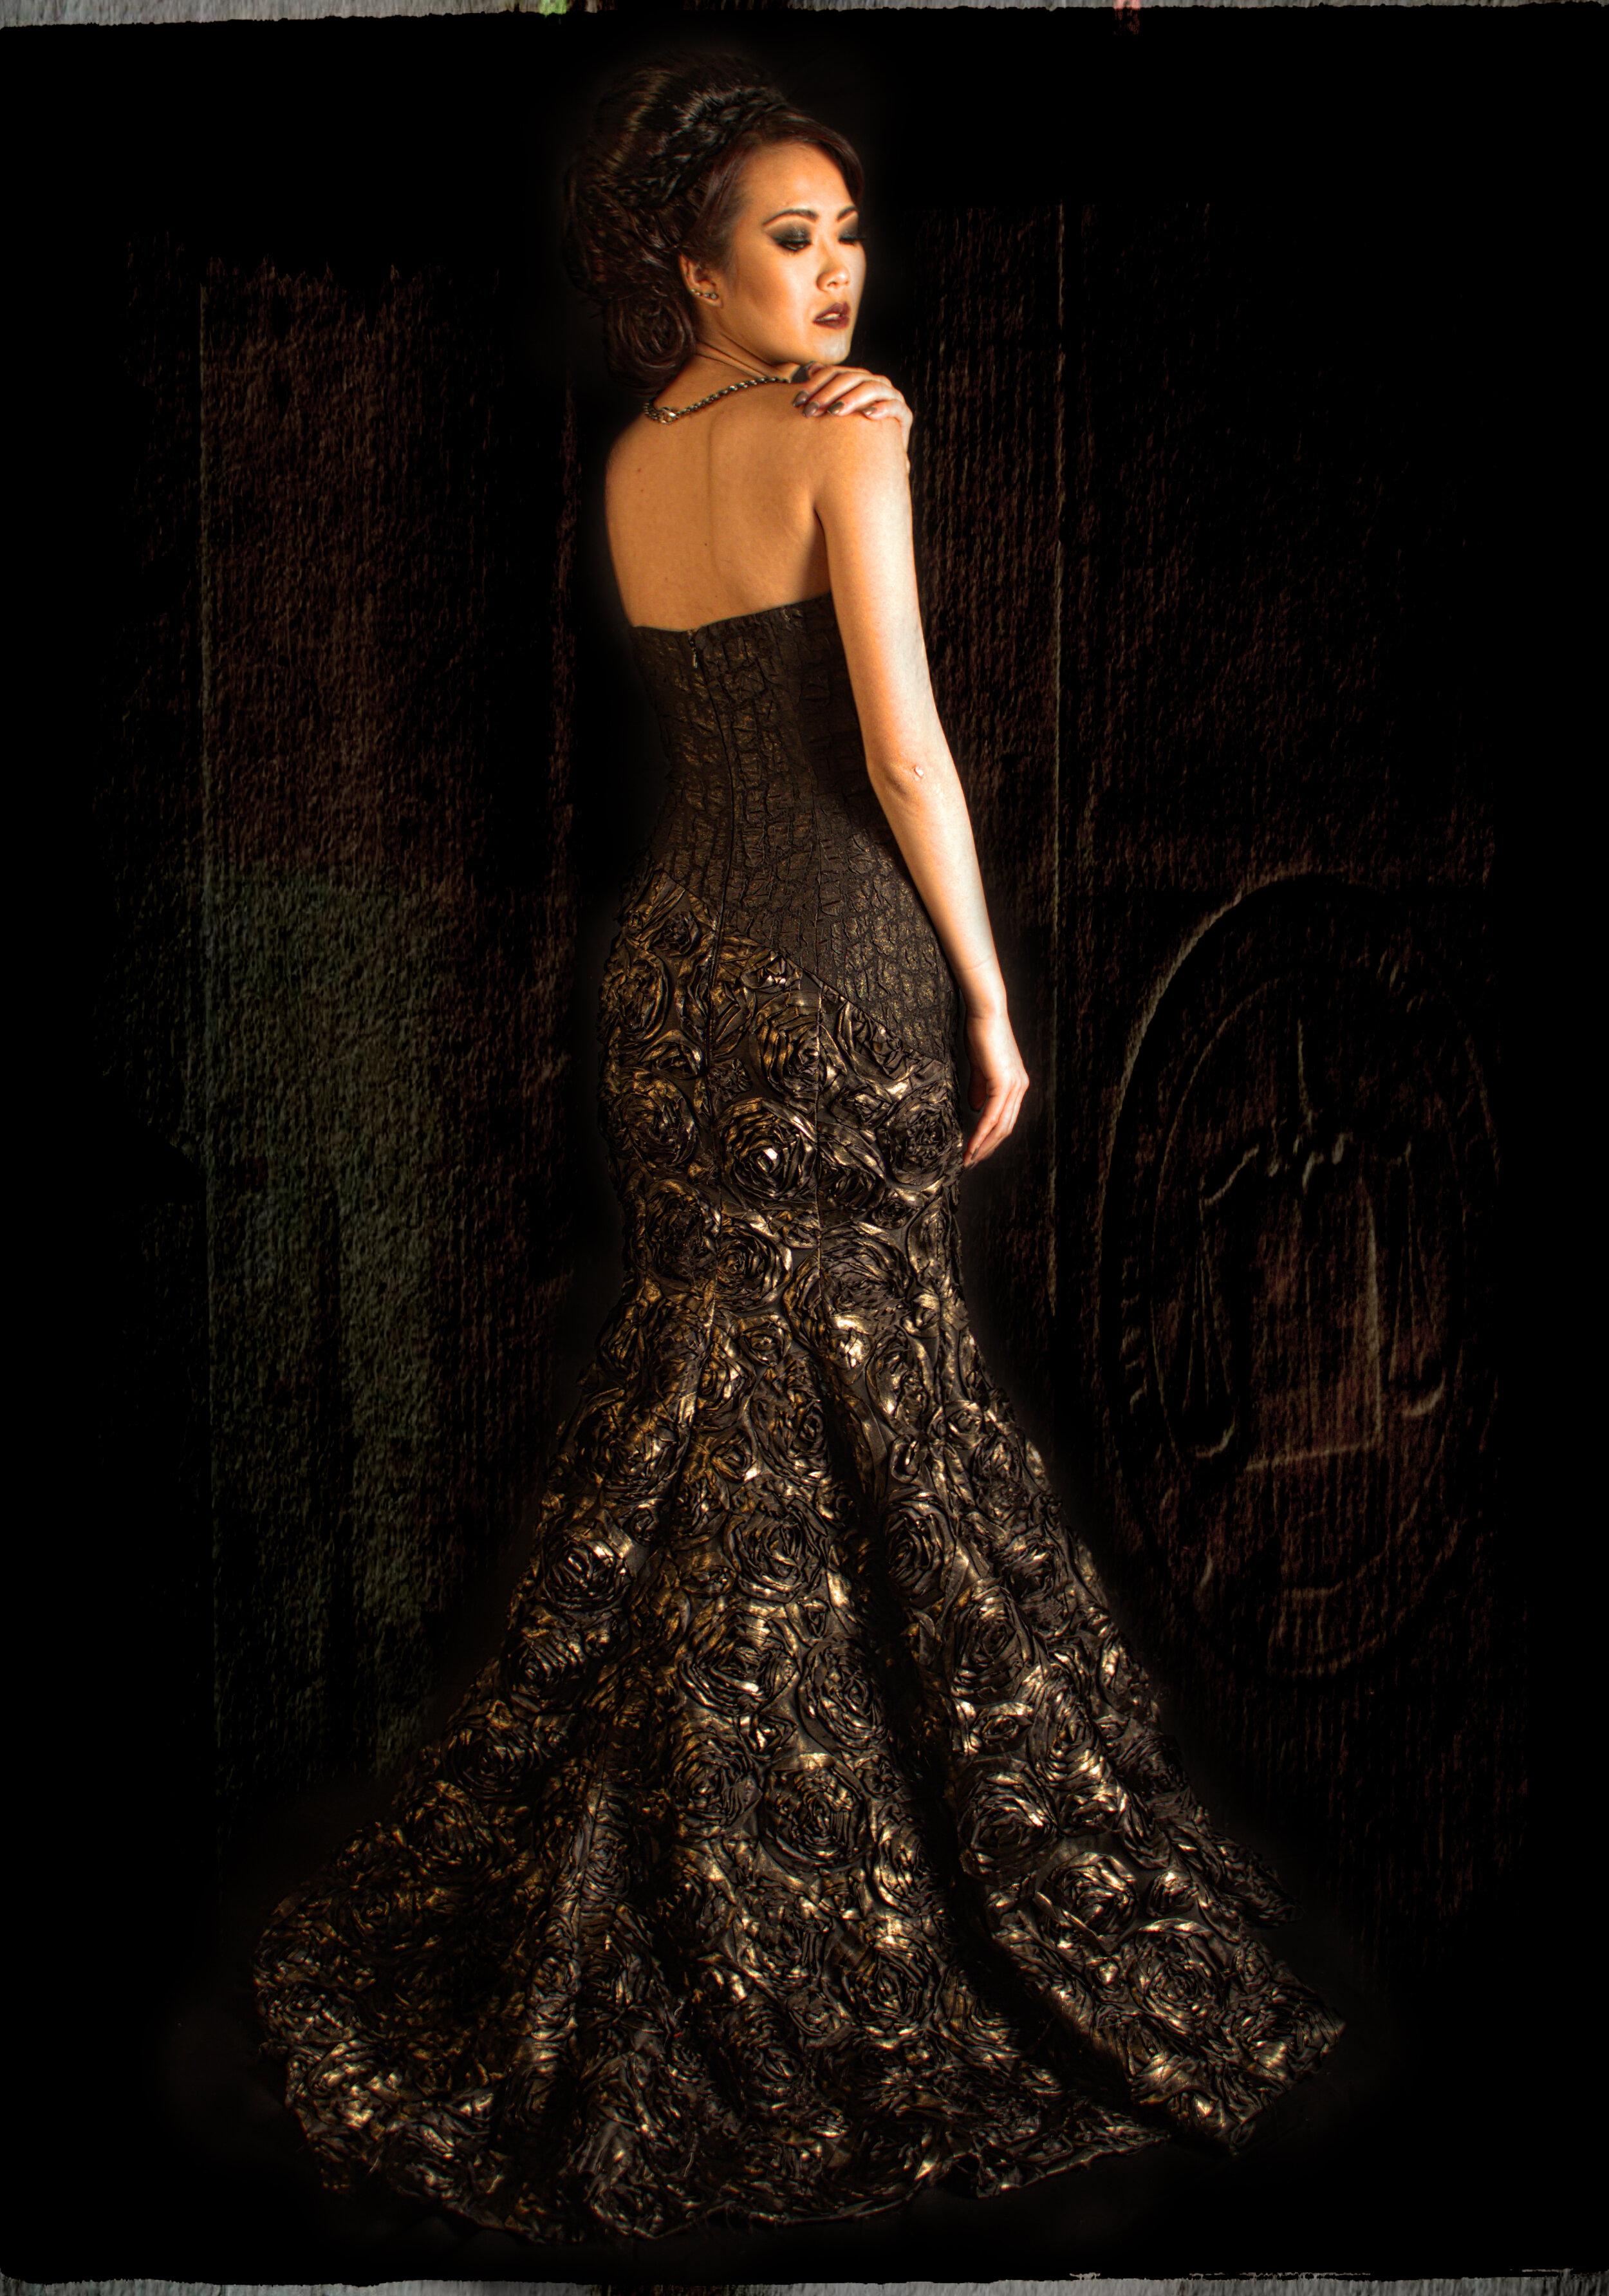 Bespoke couture sleeveless trumpet evening dress made of 3d rosetta fabric designed by Alis Fashion Design.jpg